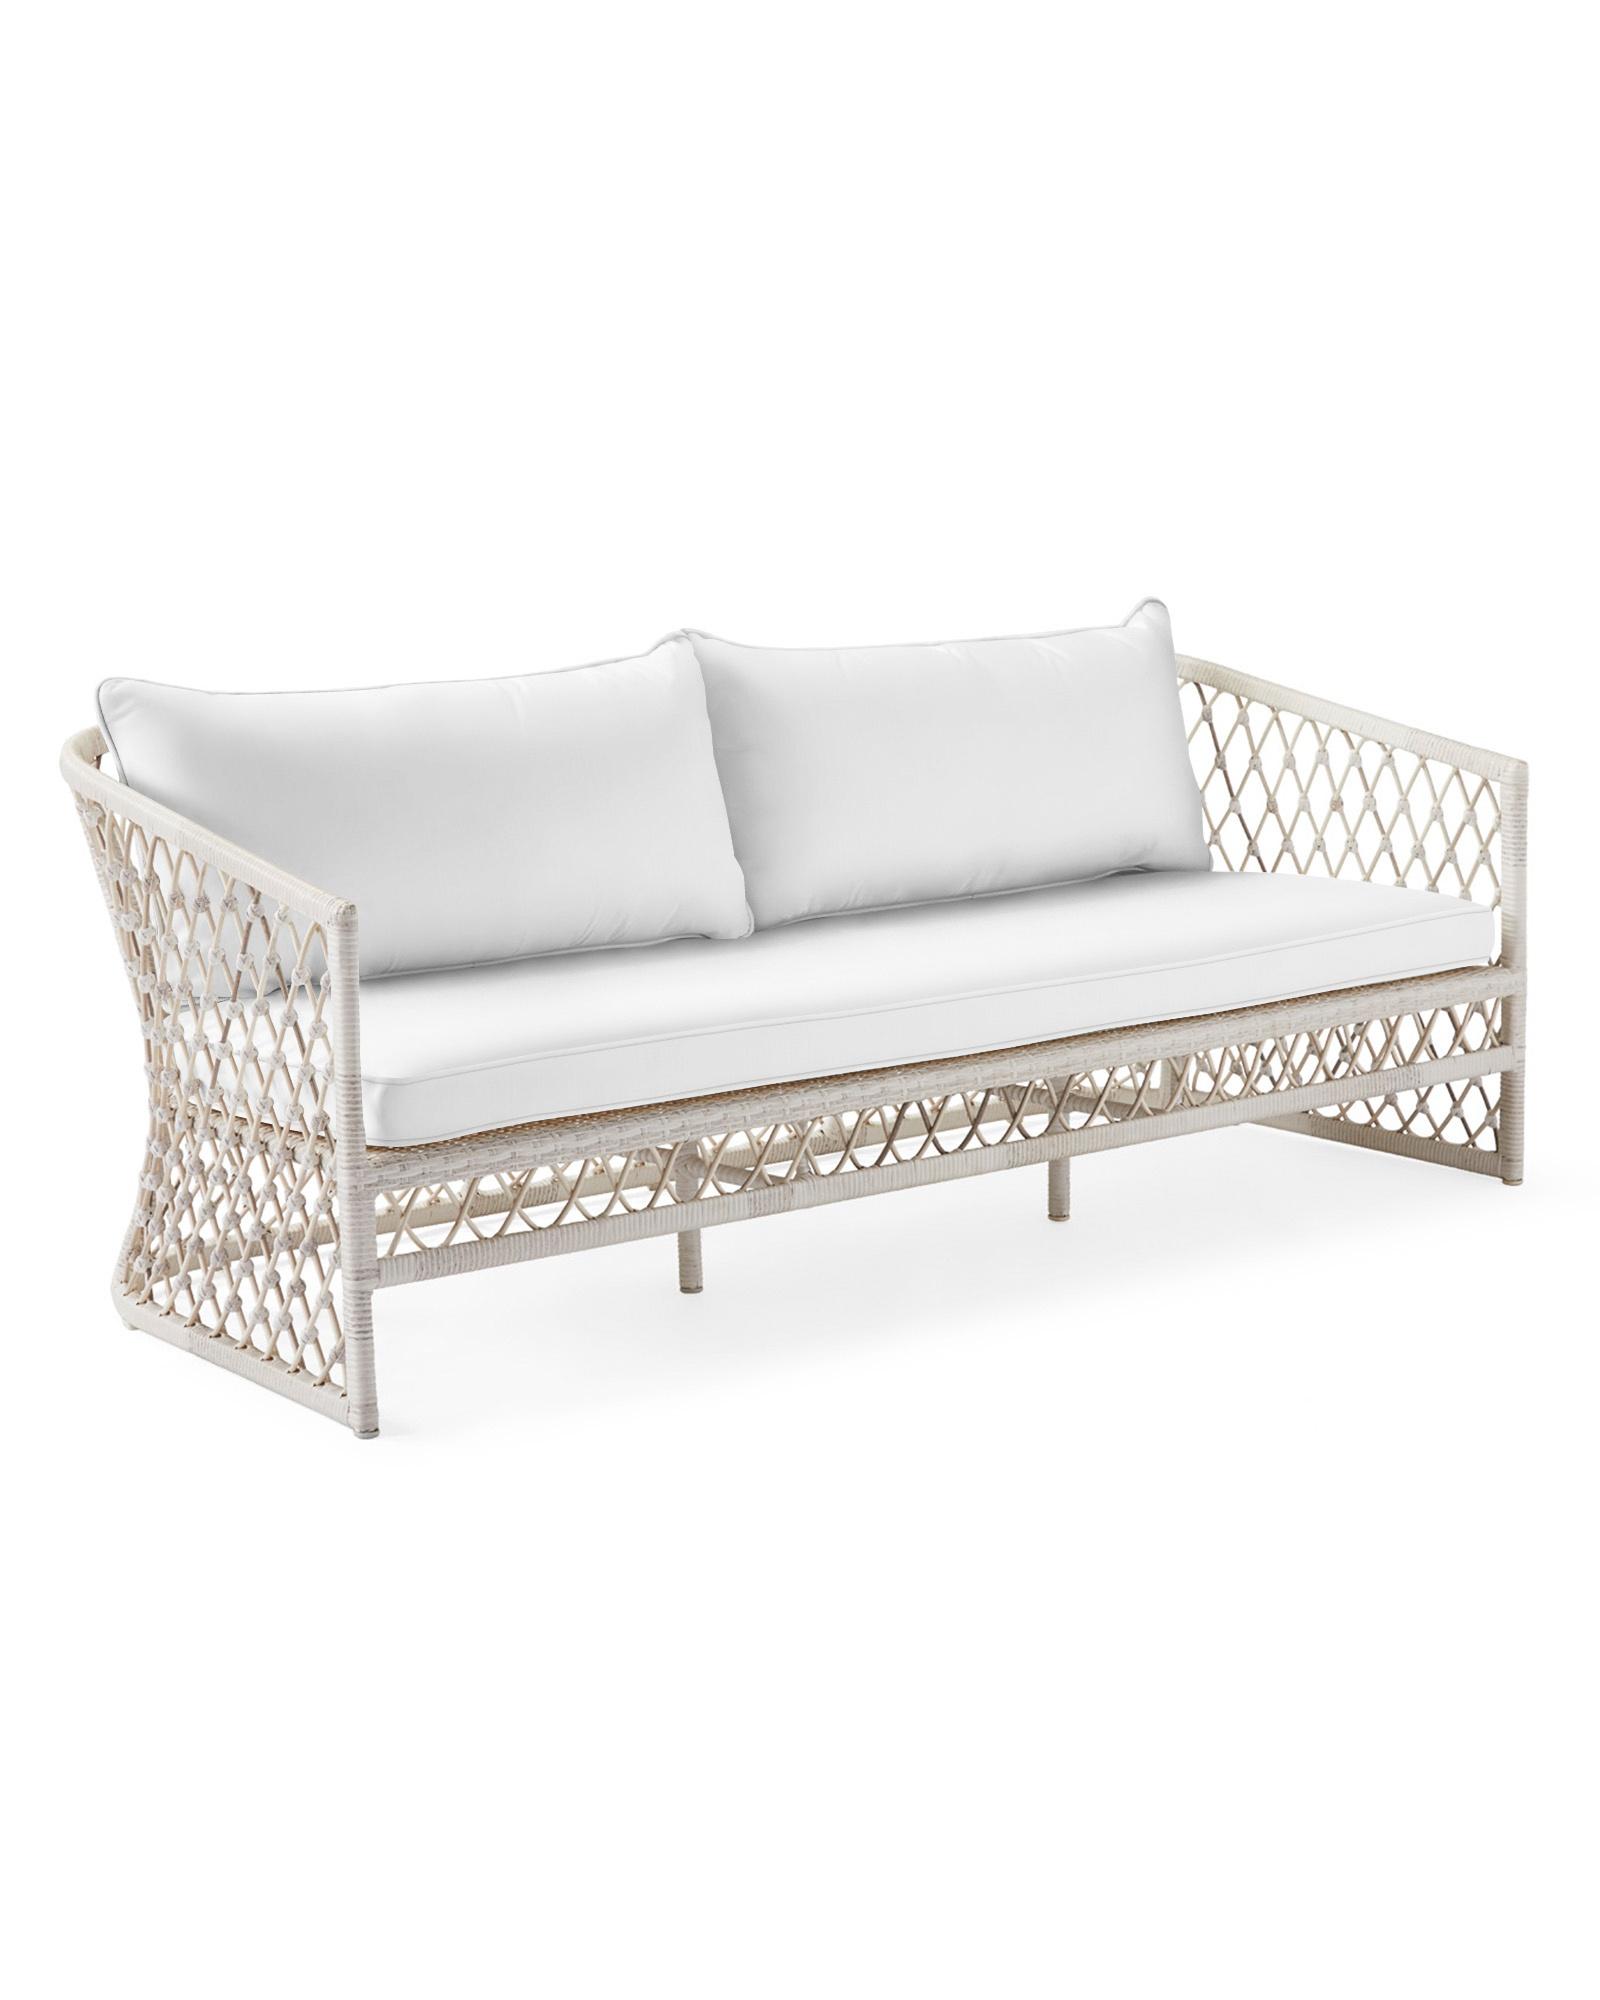 Capistrano Sofa - Driftwood